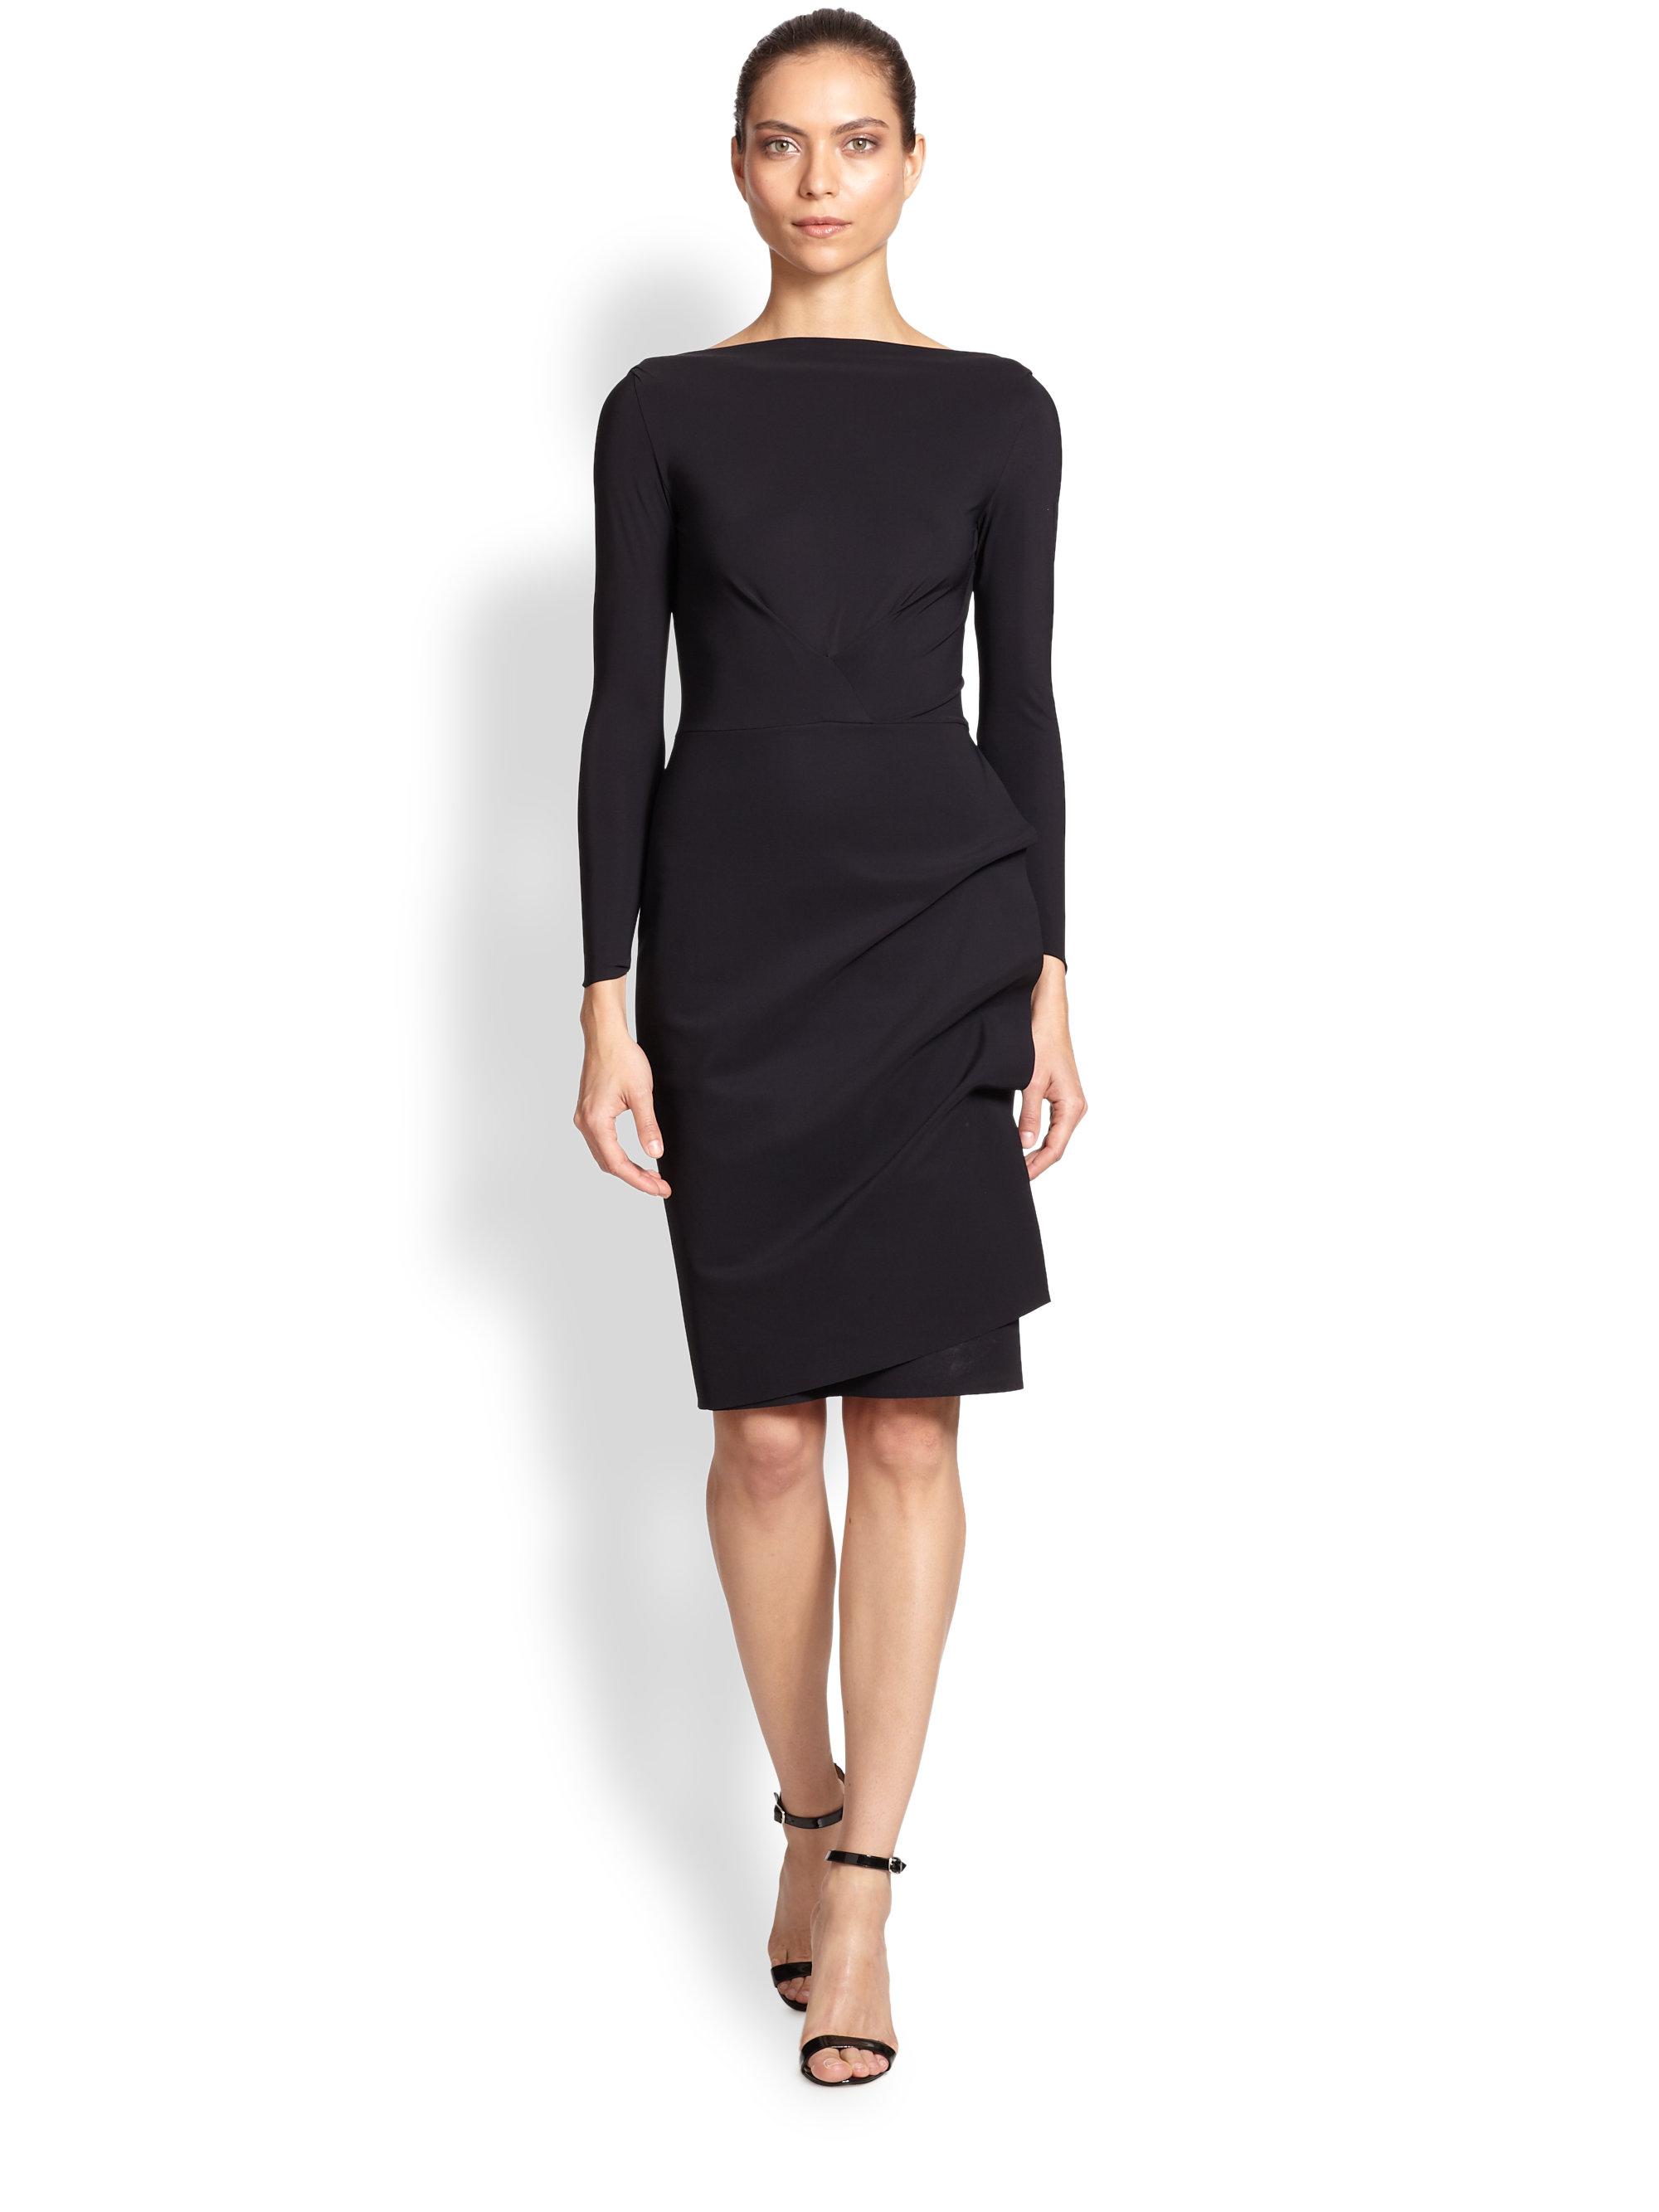 Black Long Sleeve Cocktail Dresses